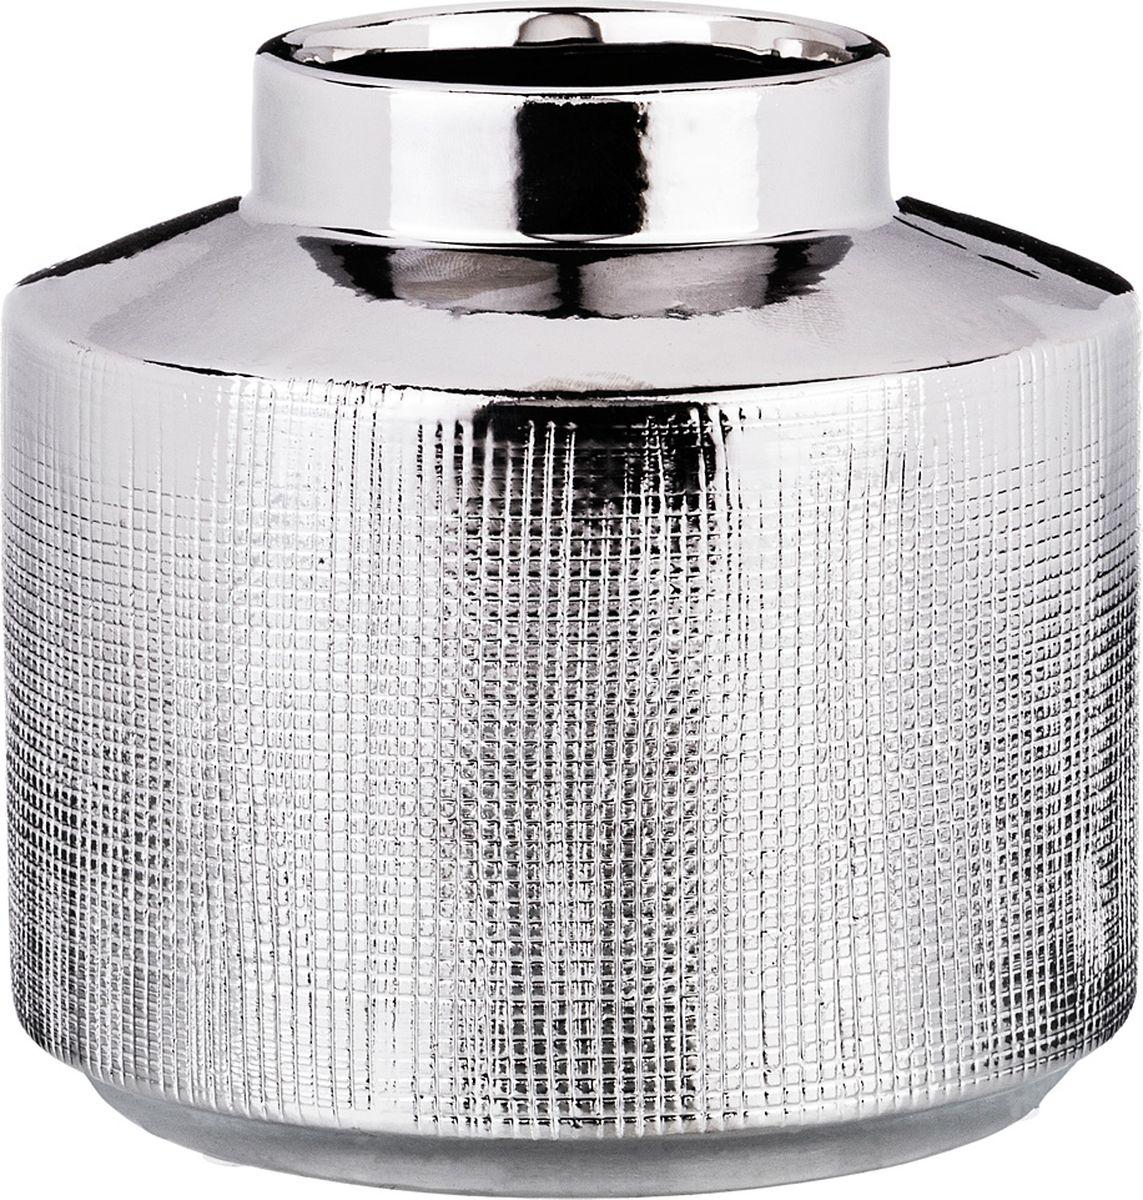 Ваза Lefard, цвет: серебристый, 13 х 13 х 12 см ваза lefard diamantes 64 291 белый 12 х 12 х 24 см